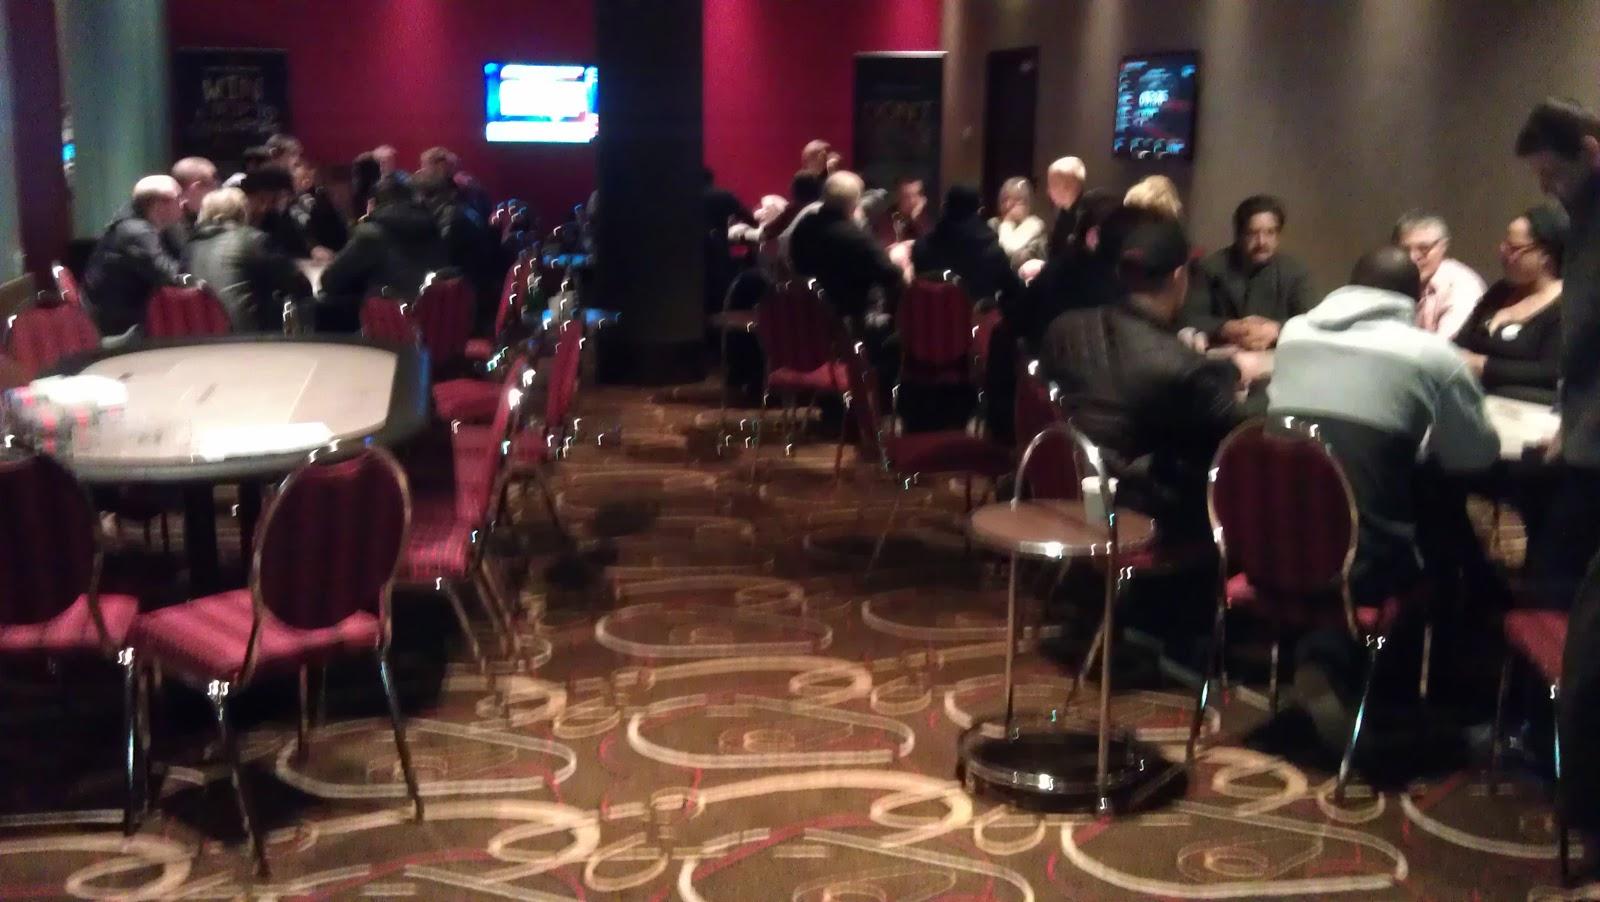 Genting casino coventry poker